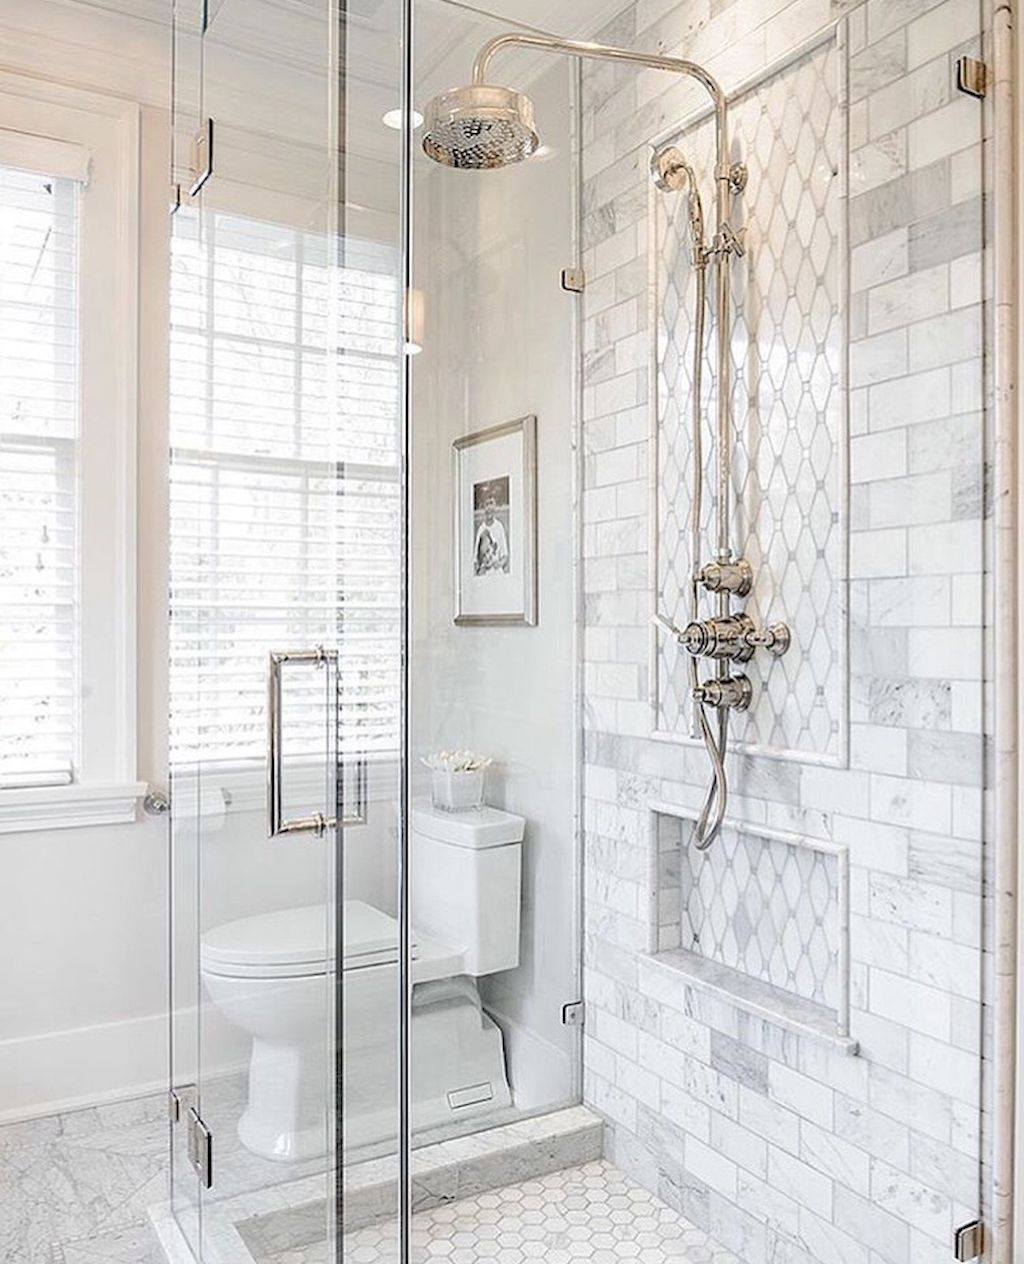 40 Beautiful Bathroom Shower Tile Design Ideas and ...